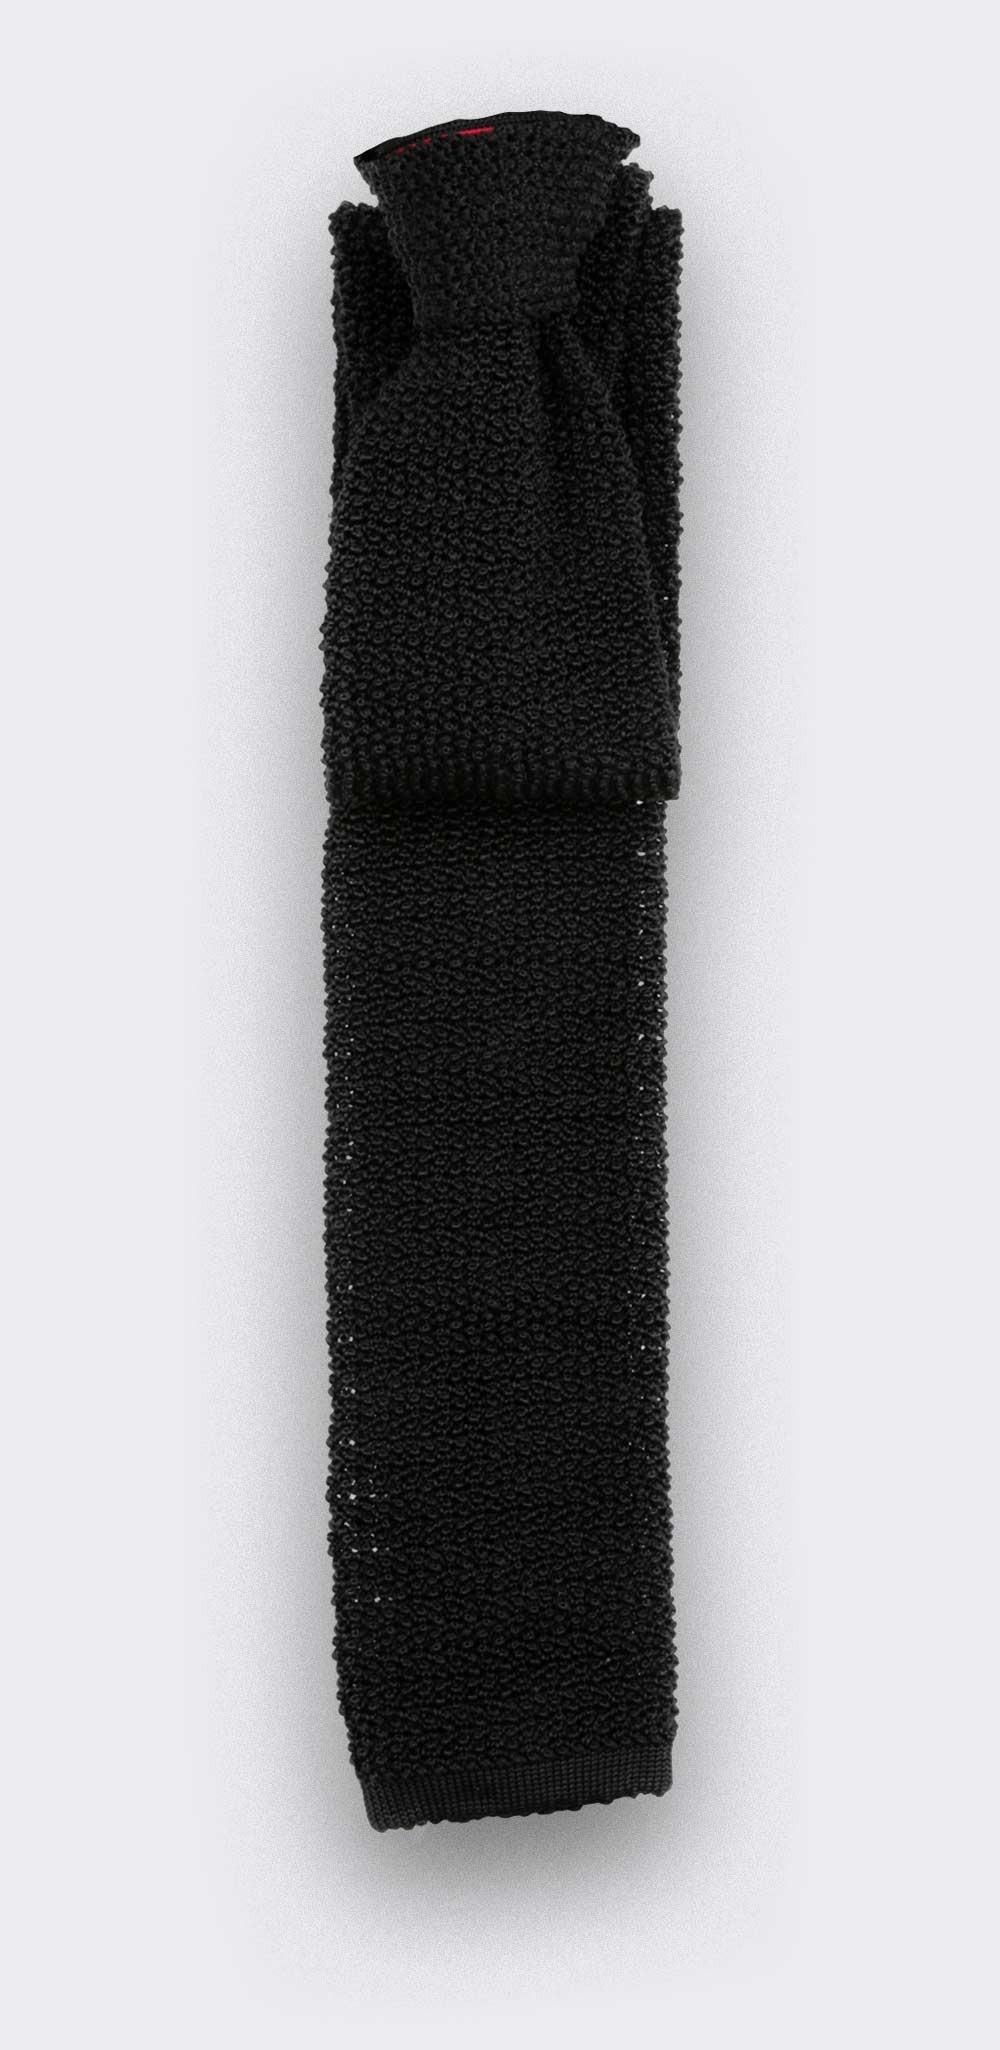 Black Knitted Tie - Cinabre Paris